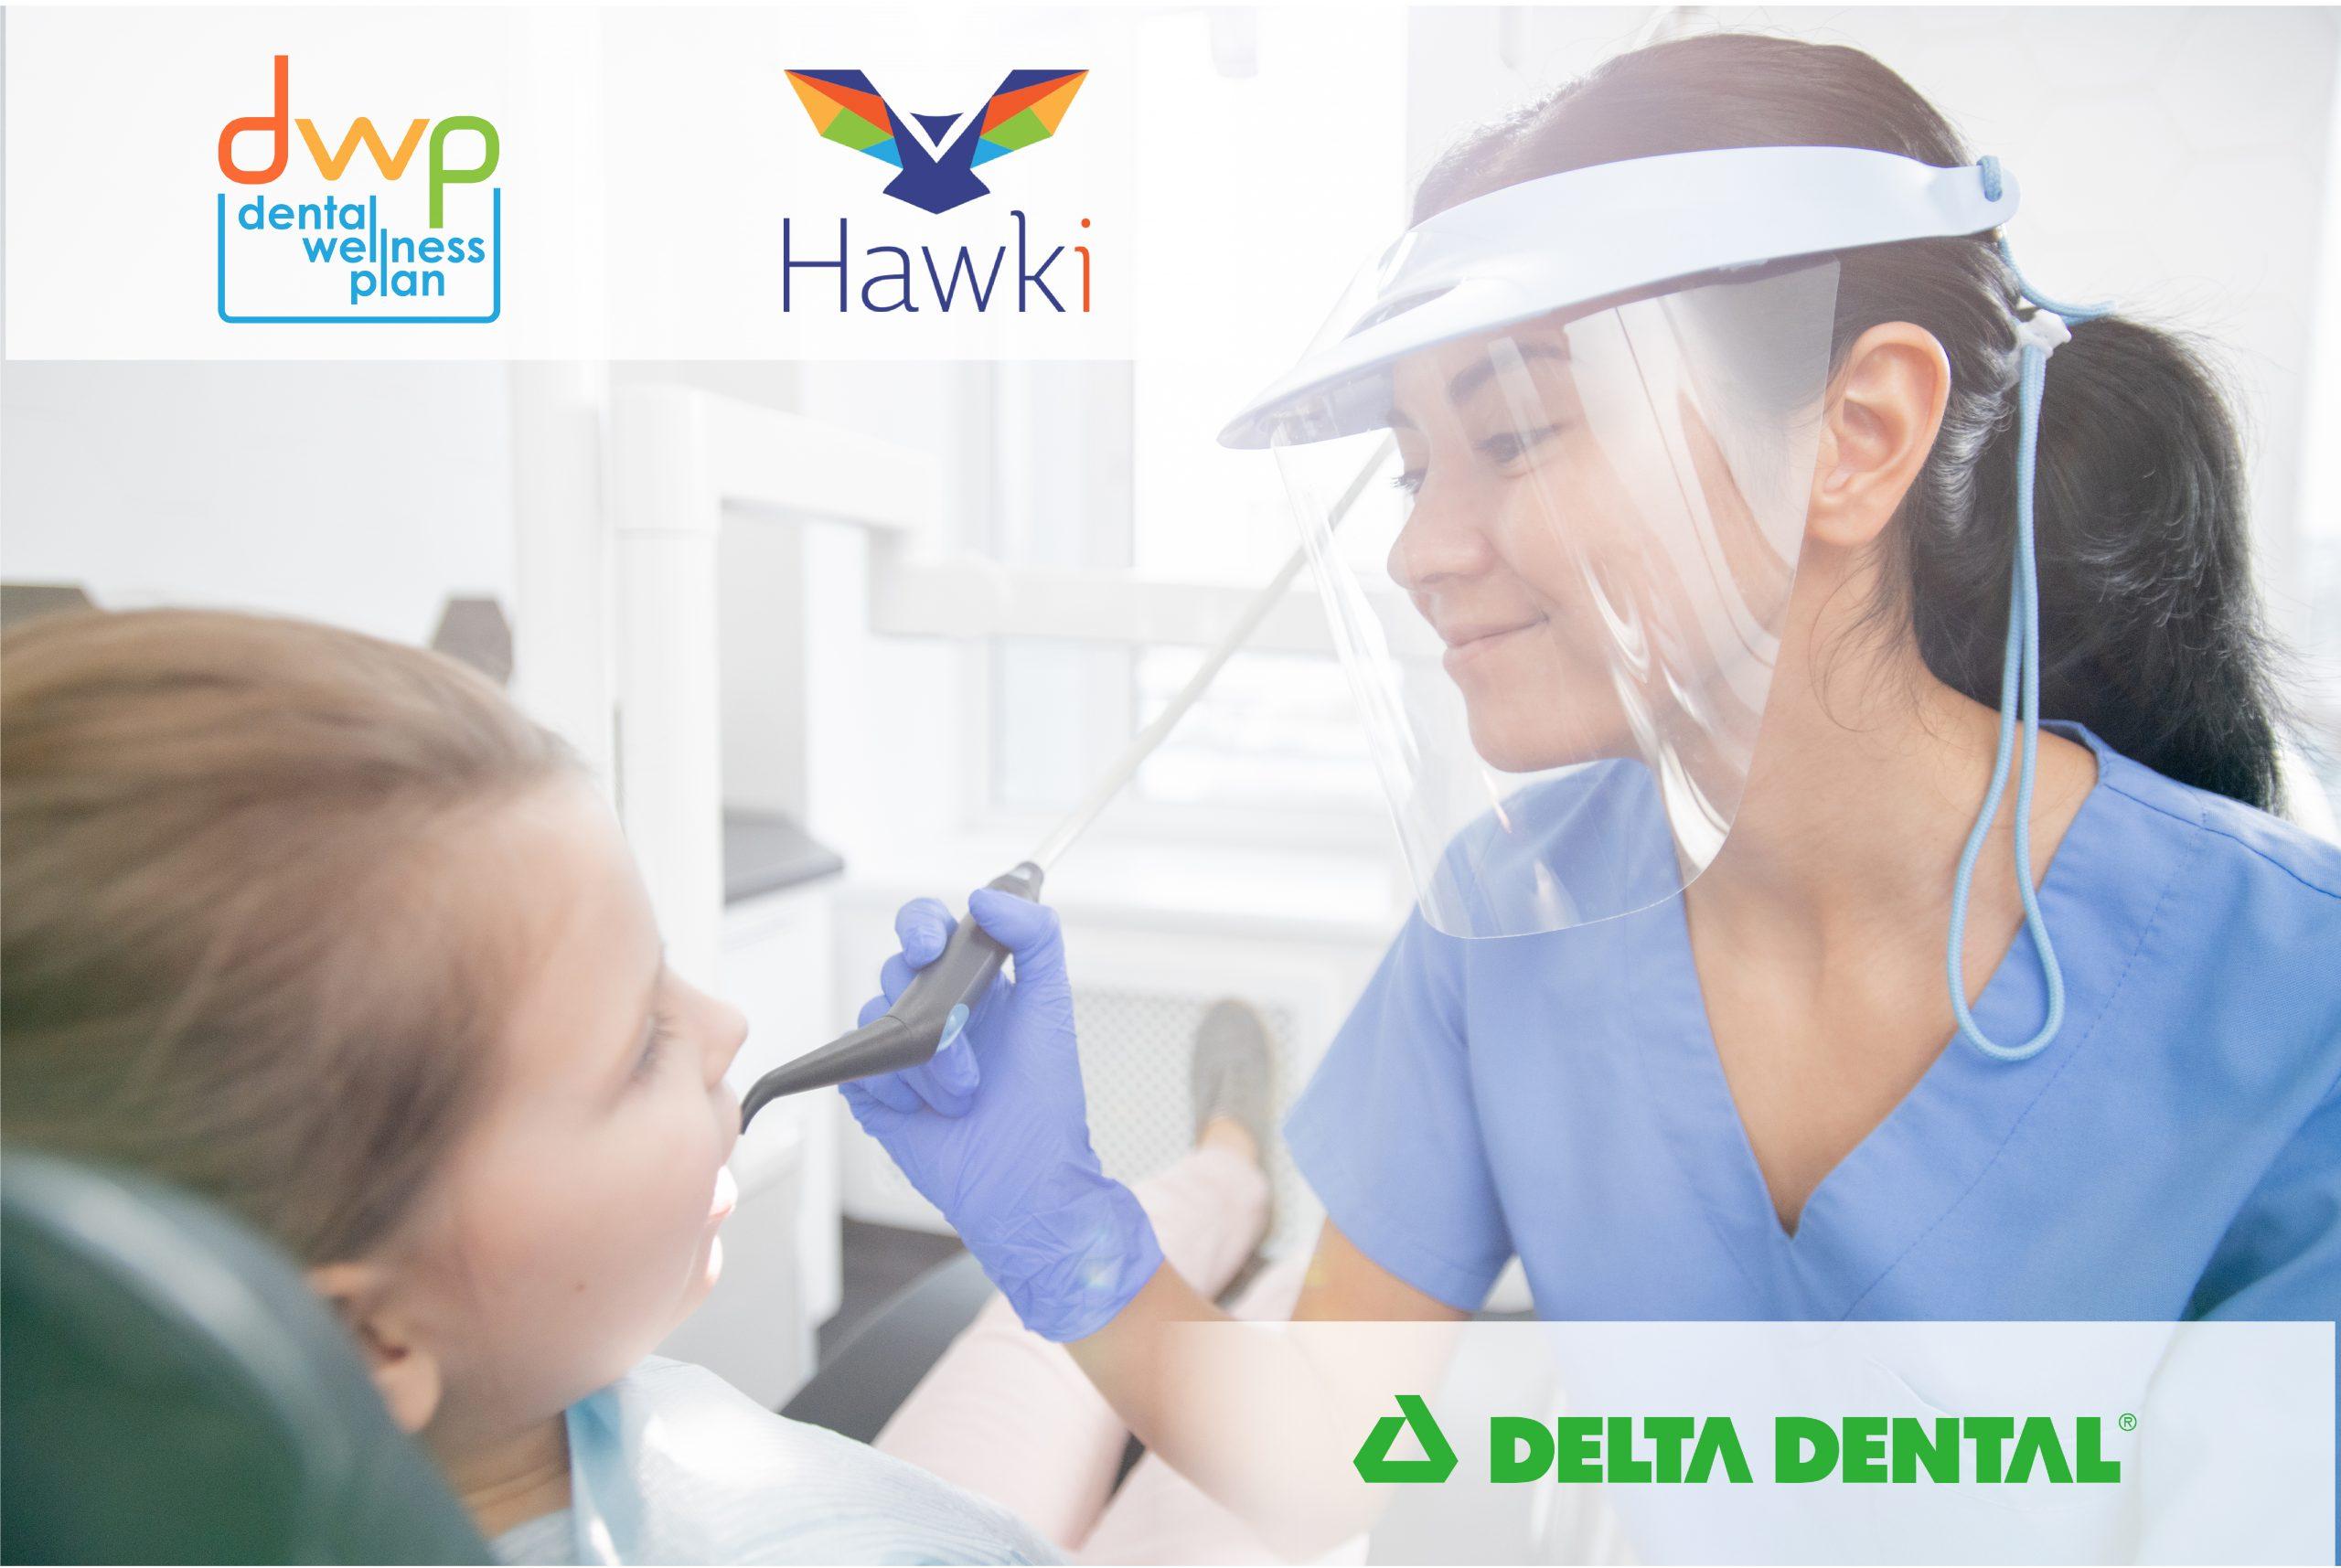 Delta Dental Image